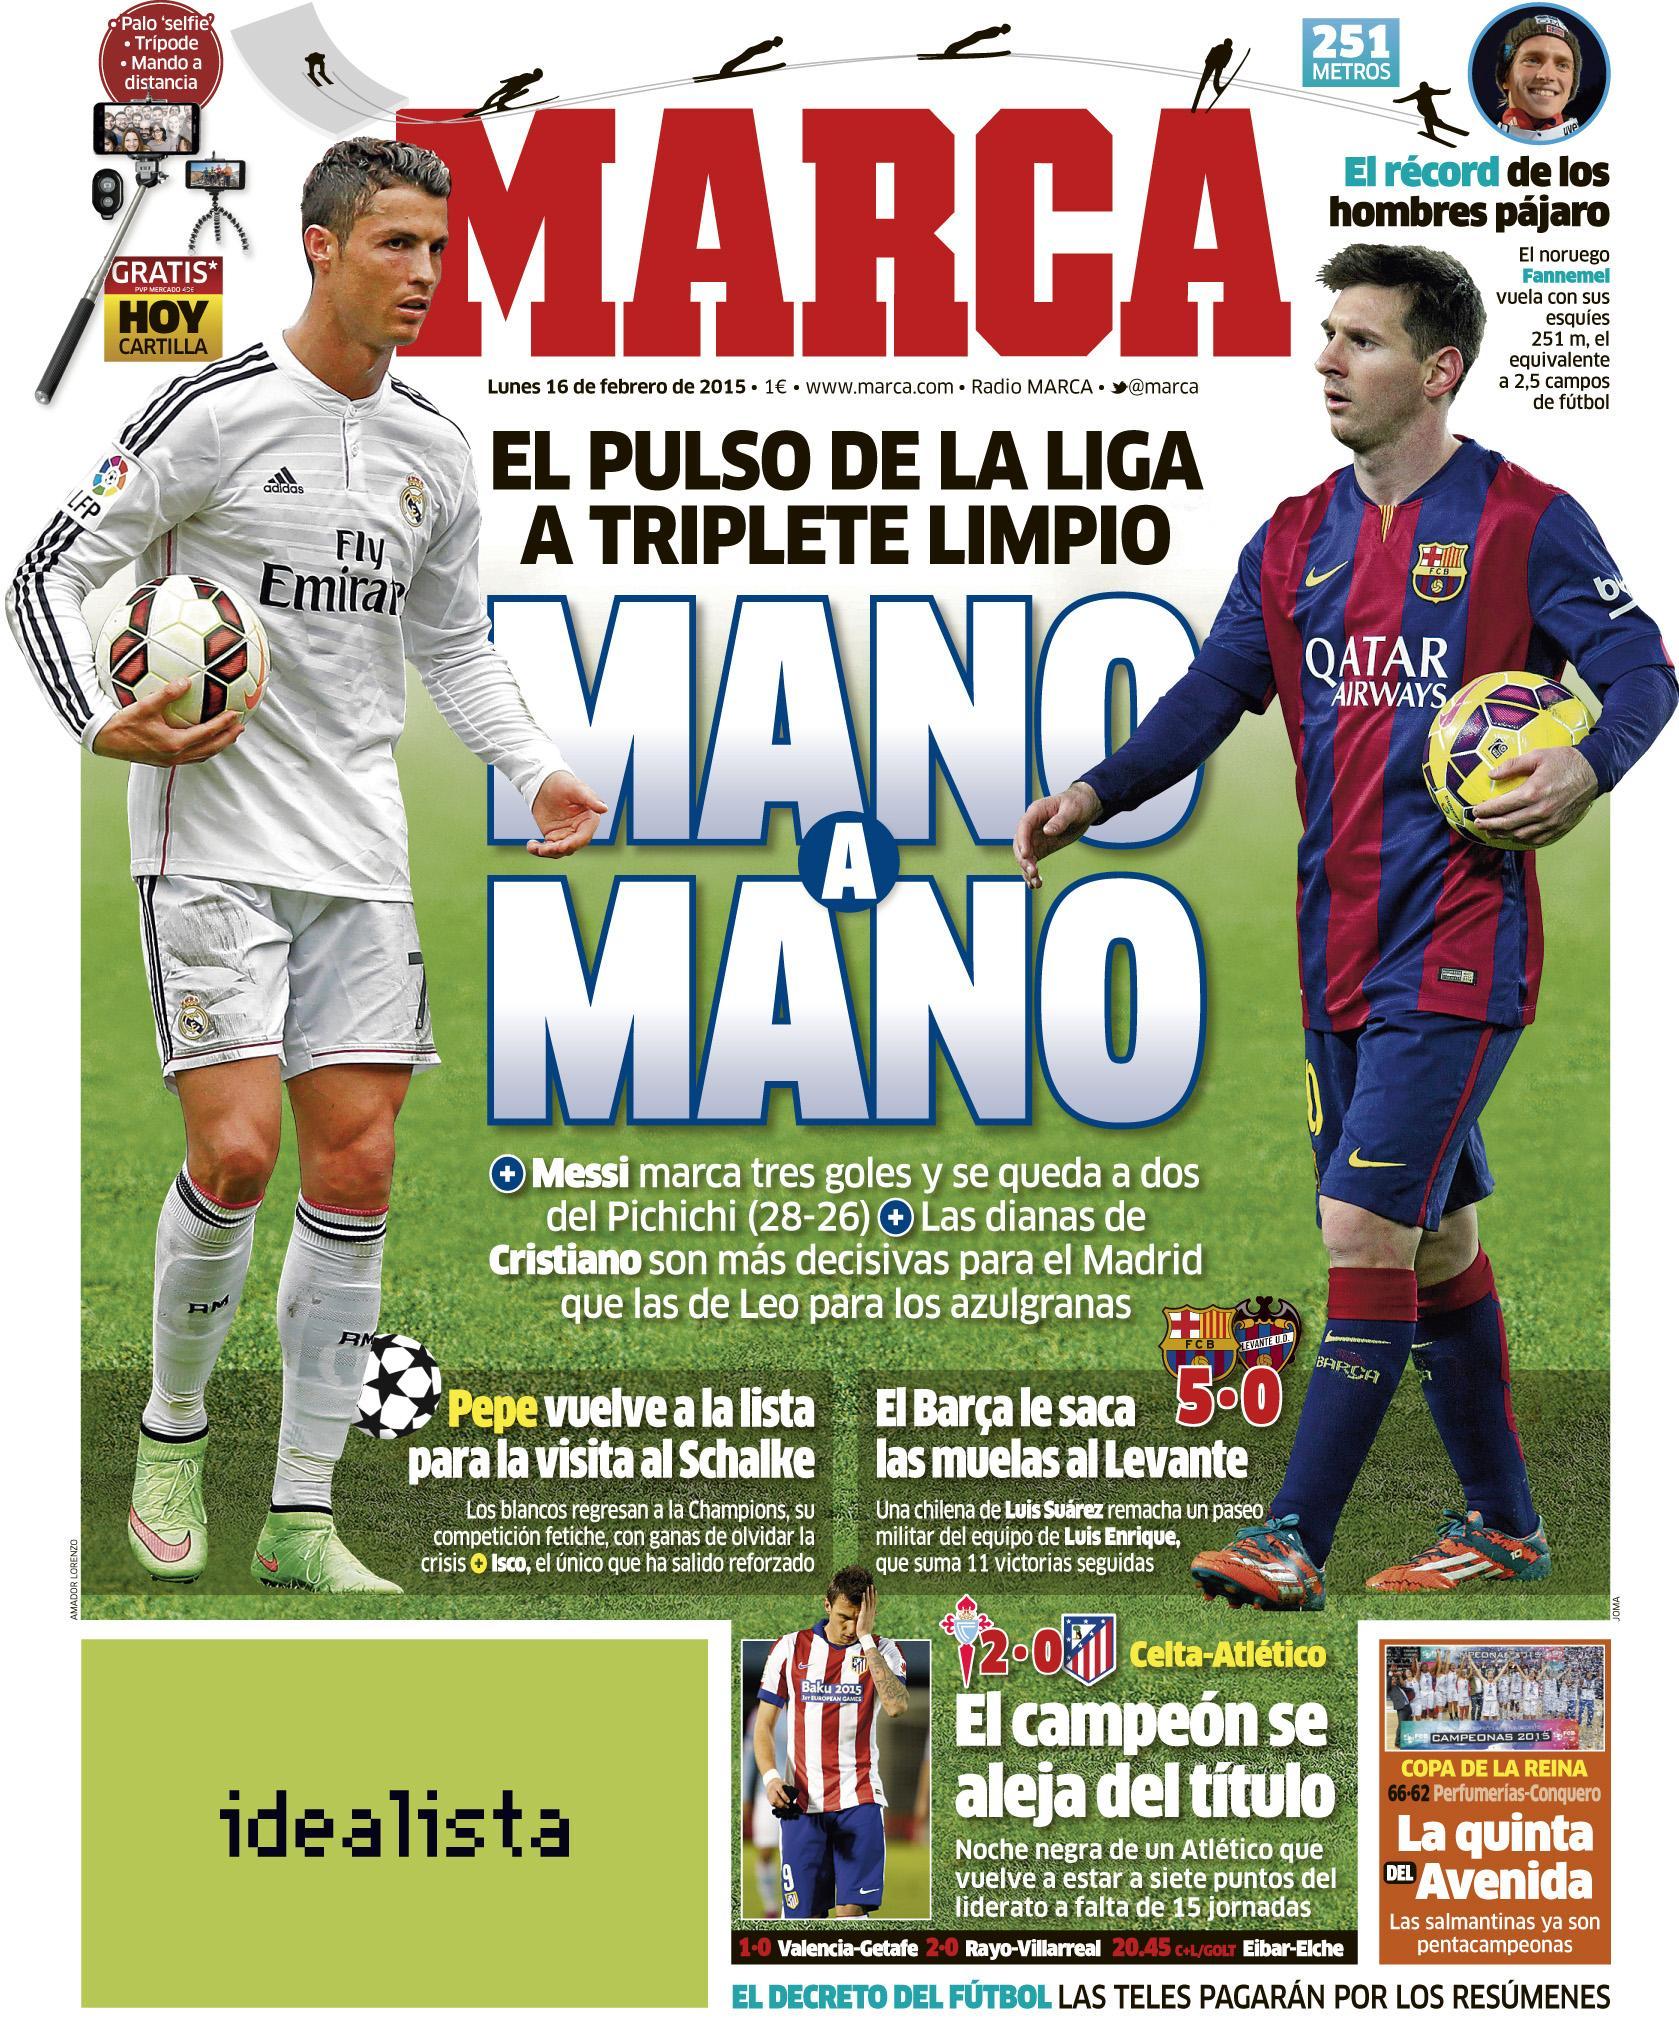 Deportes - Magazine cover